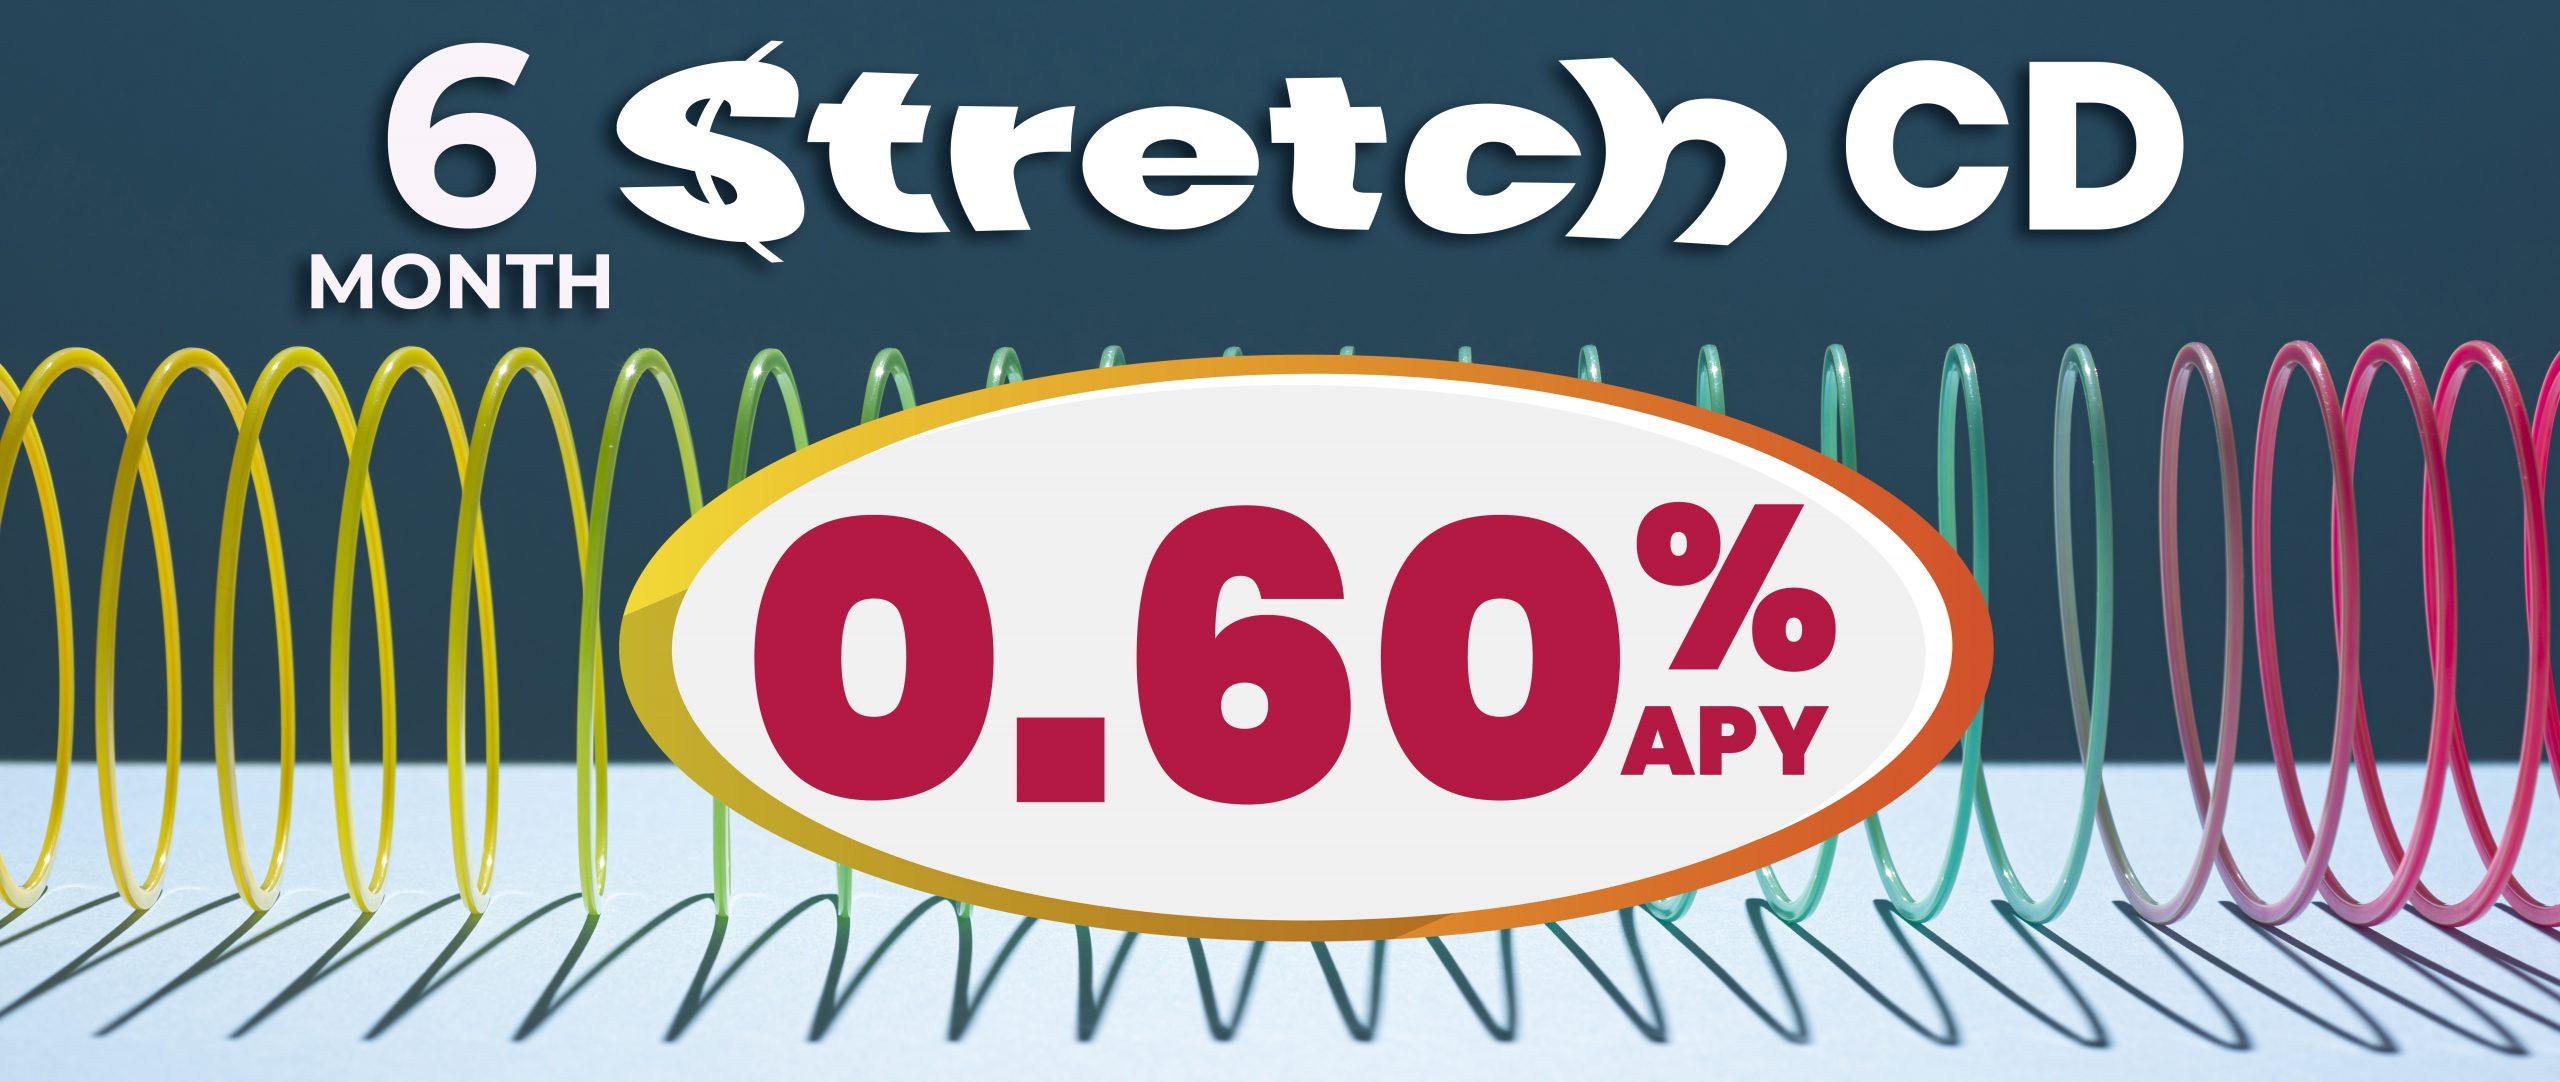 6-Month Stretch CD 0.60% APY